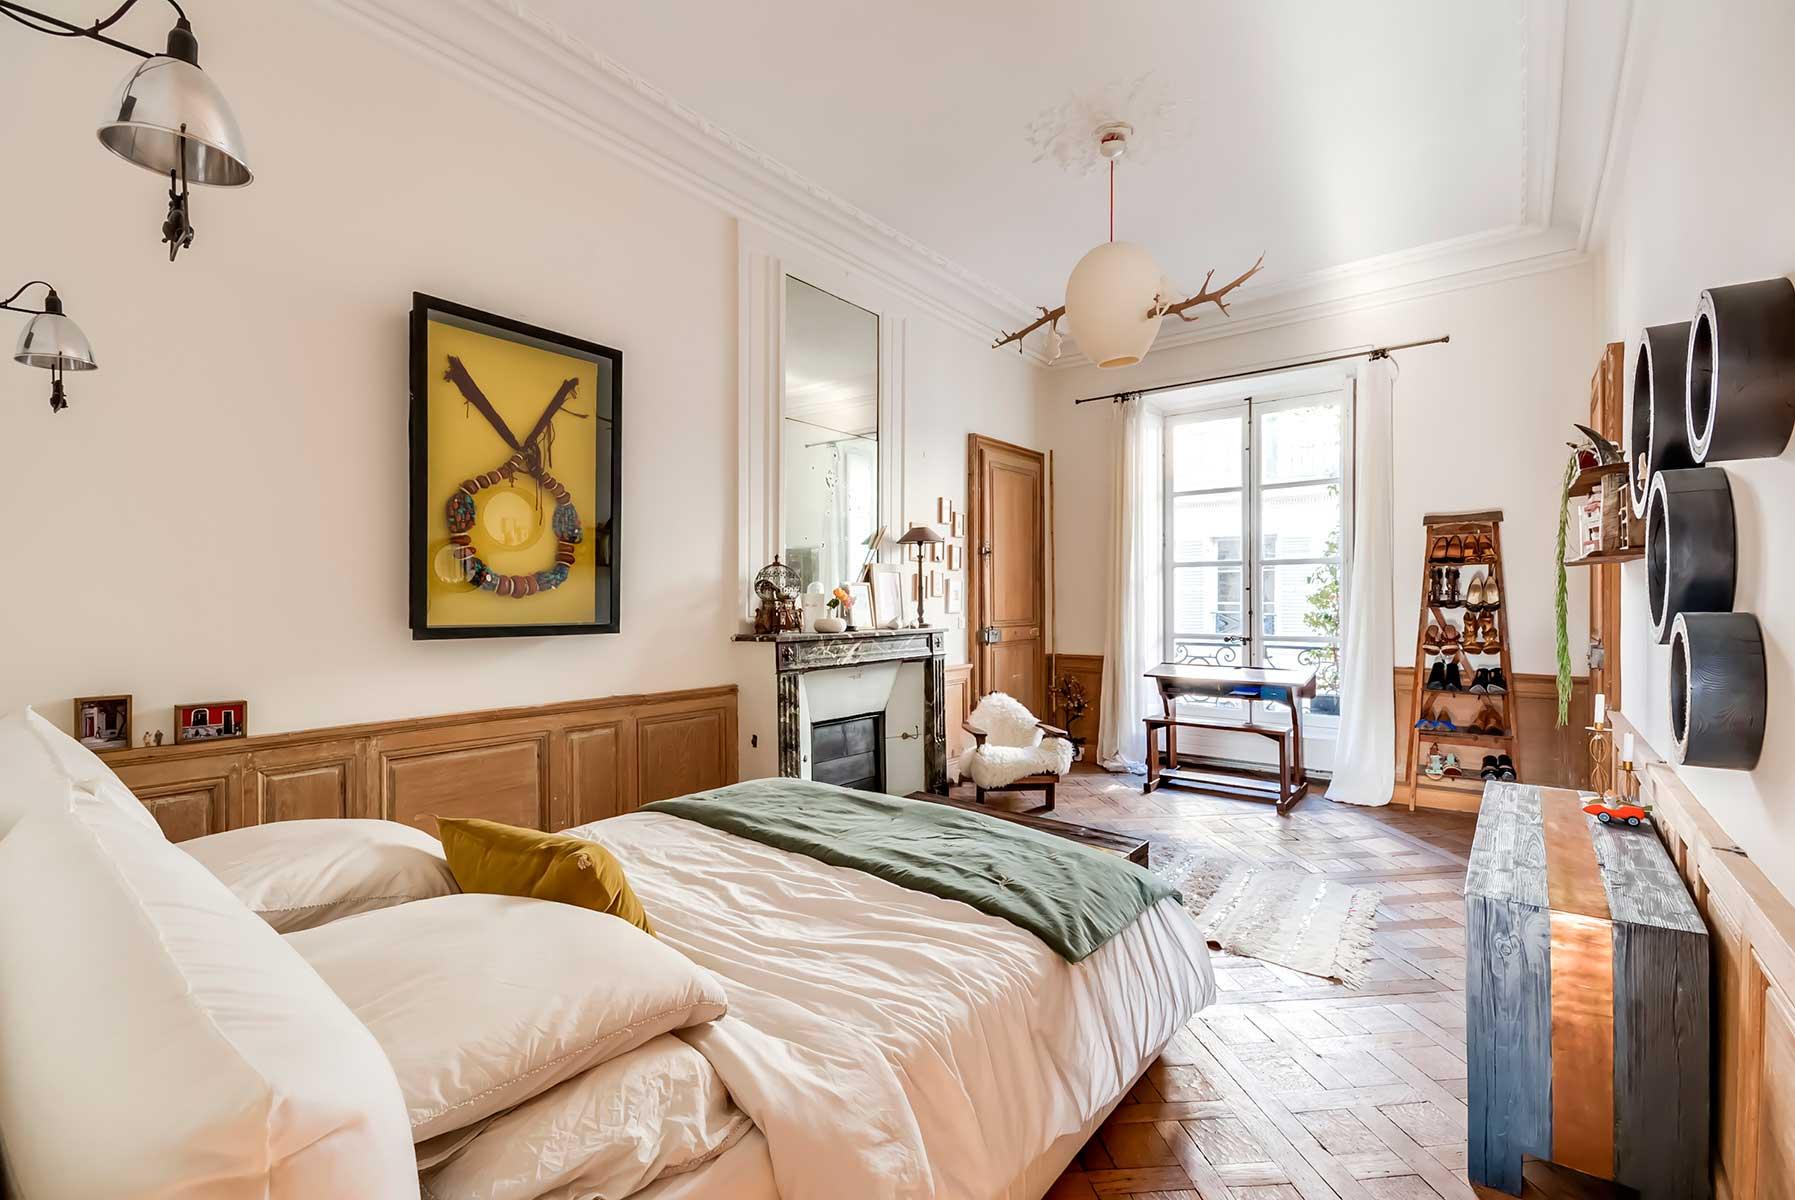 Однокомнатная квартира в стиле французского прованса